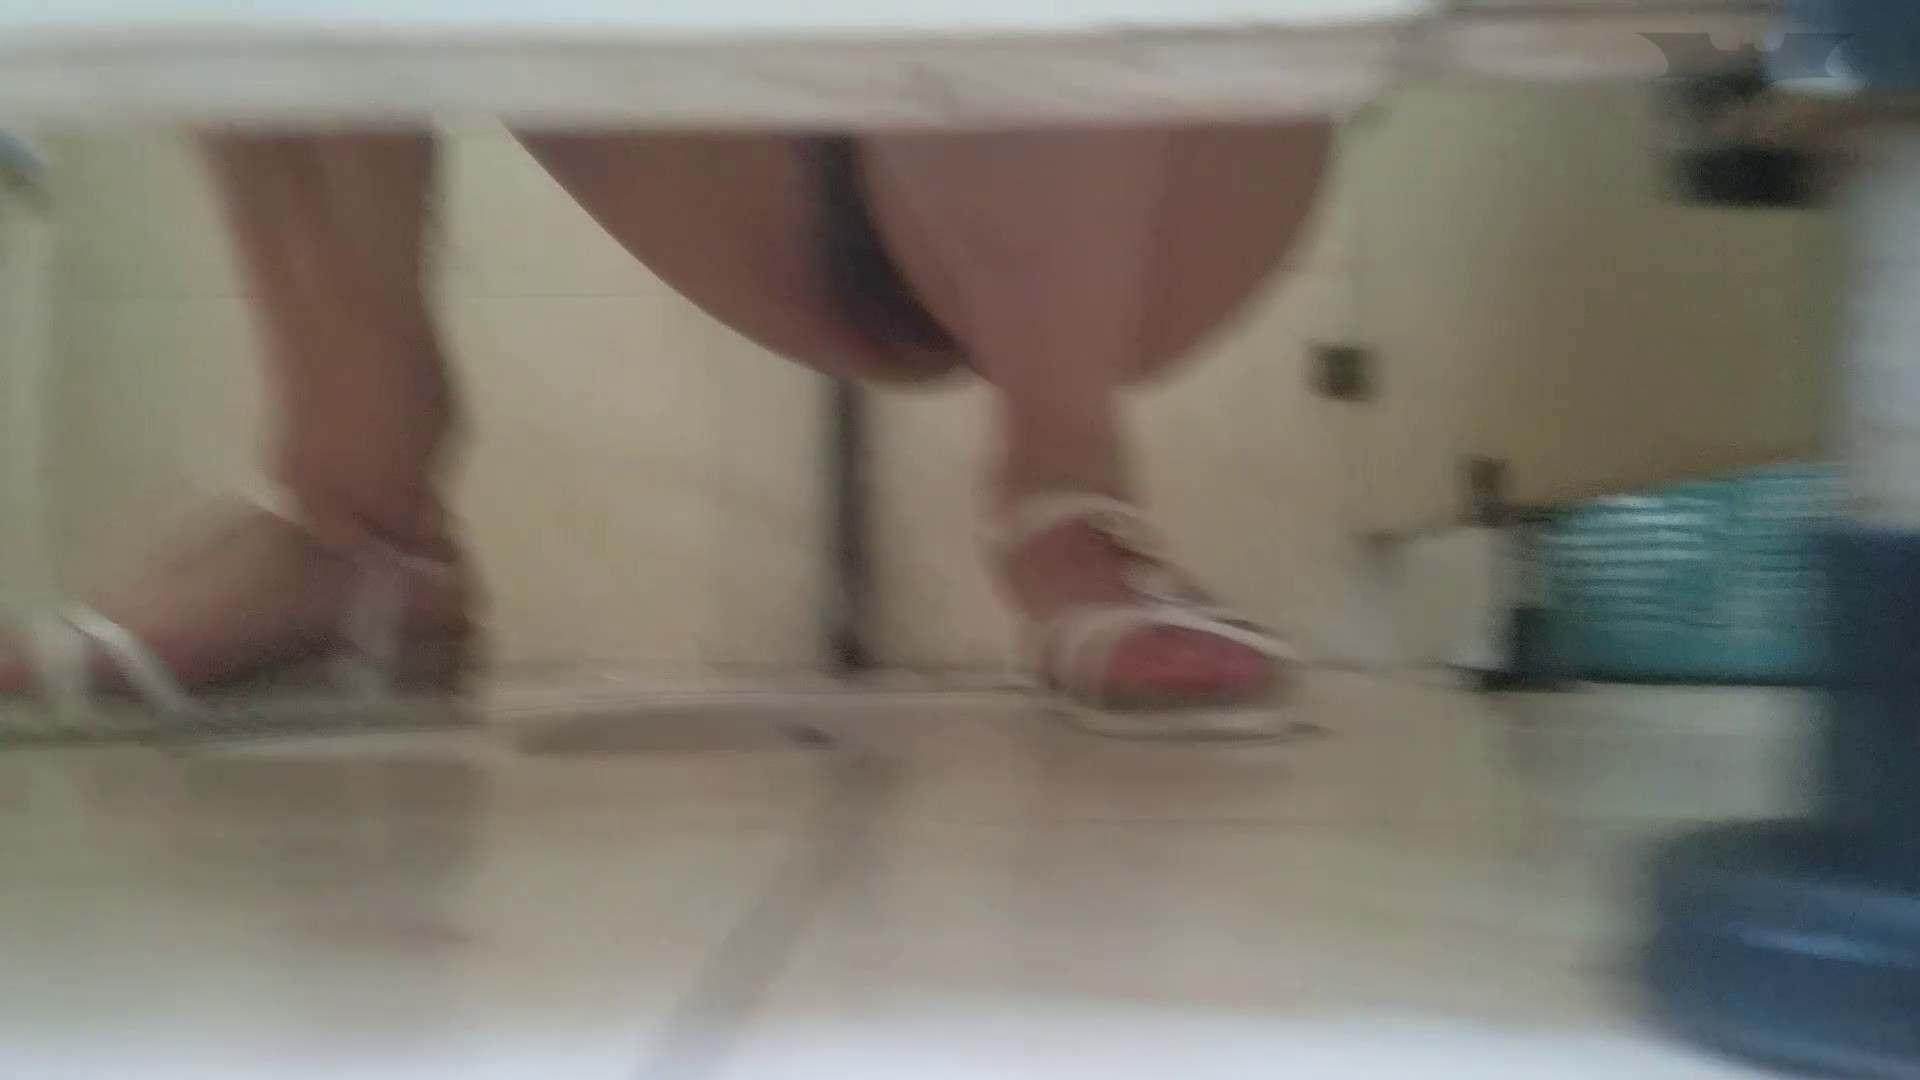 JD盗撮 美女の洗面所の秘密 Vol.70 高評価 | 丸見え  89画像 89